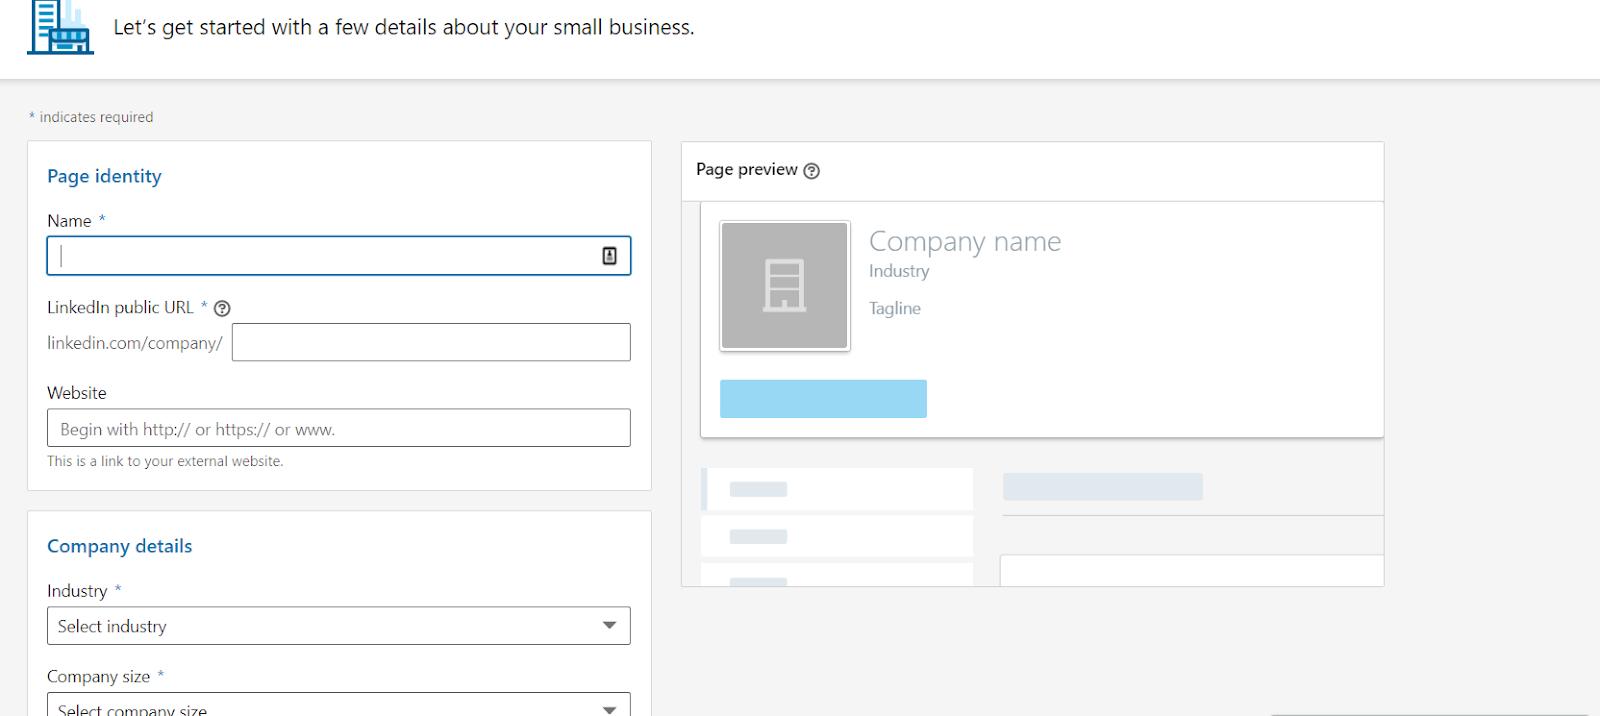 A LinkedIn Business Profile lets you create a company presence.